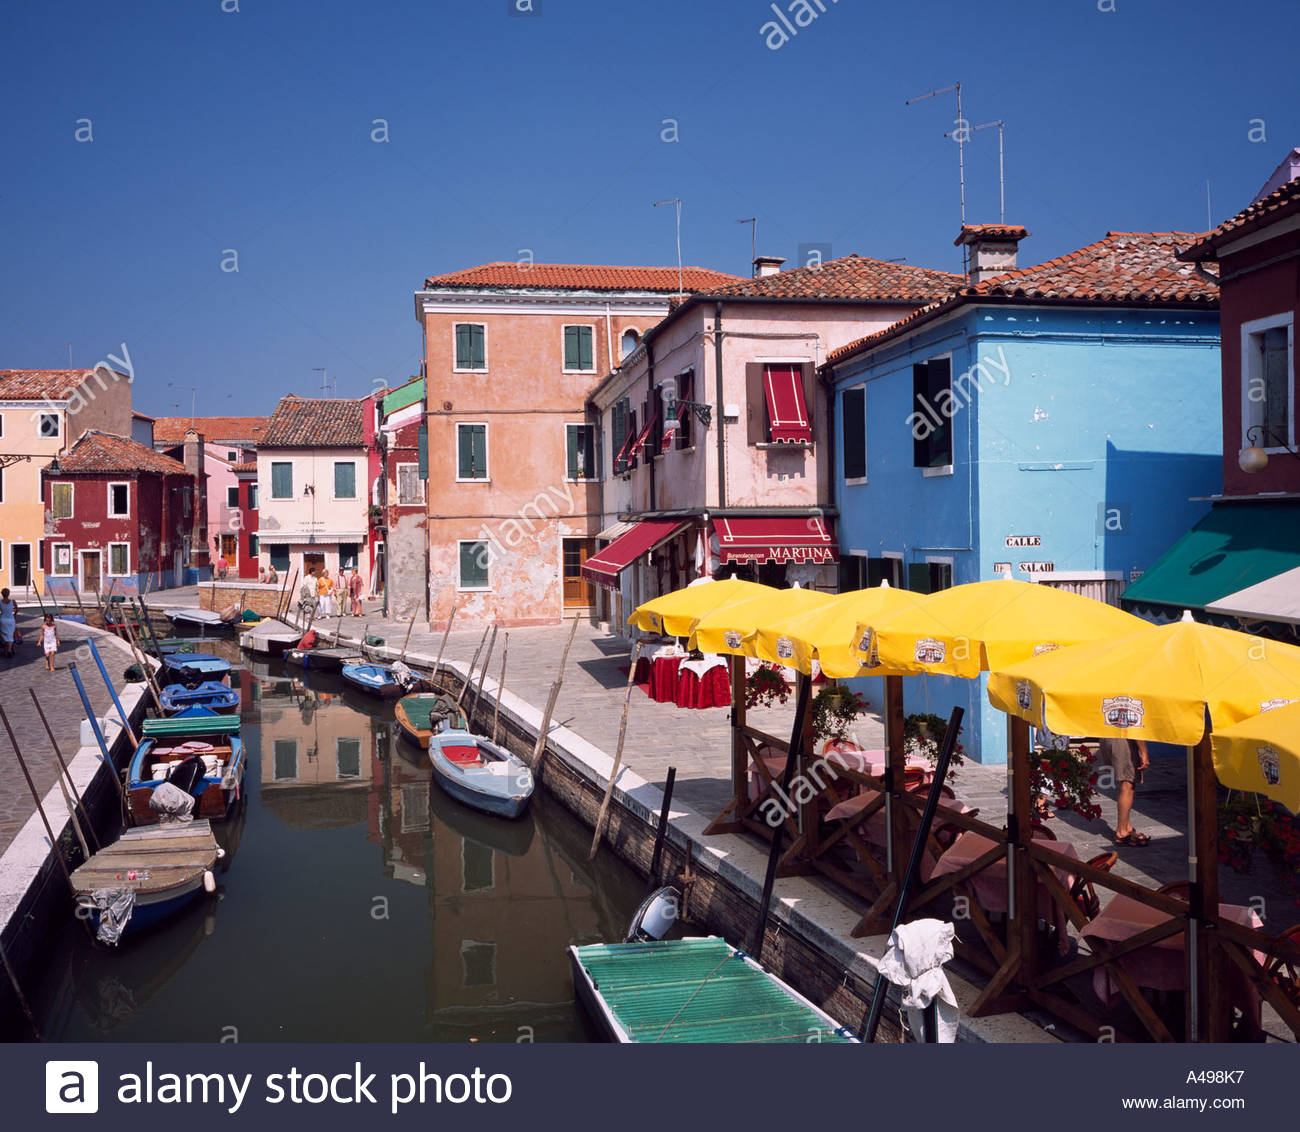 Colorful burano italy burano tourism - Stock Photo Venice Burano Island Colorful Row Of Houses Near Italy Blue Sky River Ship Rows Of Houses